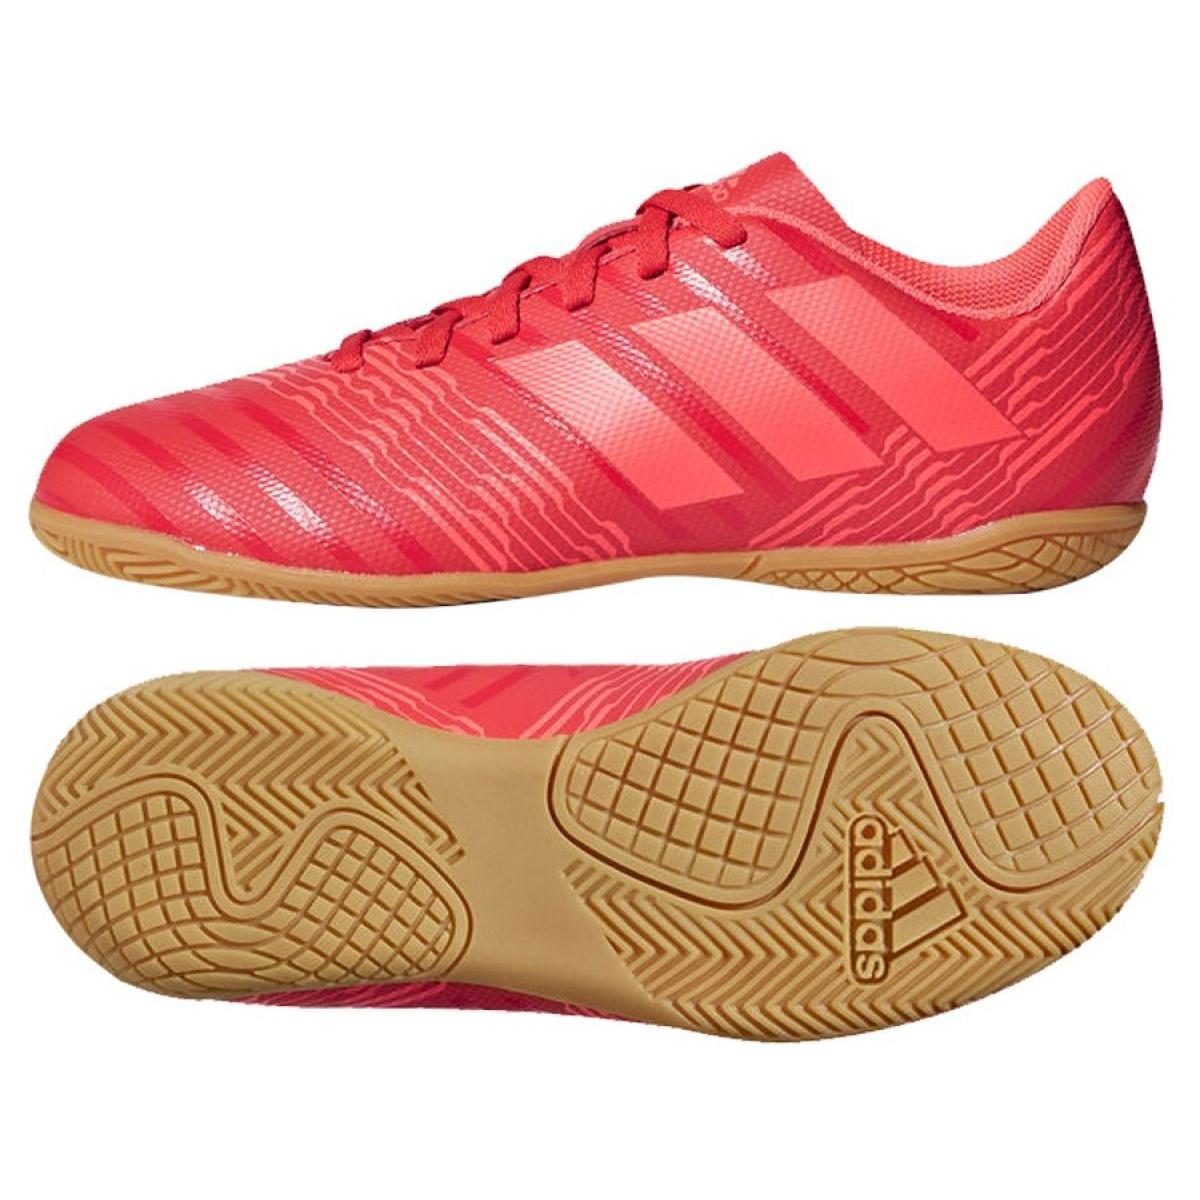 fcad48d24 Adidas Indoor shoes Nemeziz Tango 17.4 In Jr CP9222 - ButyModne.pl